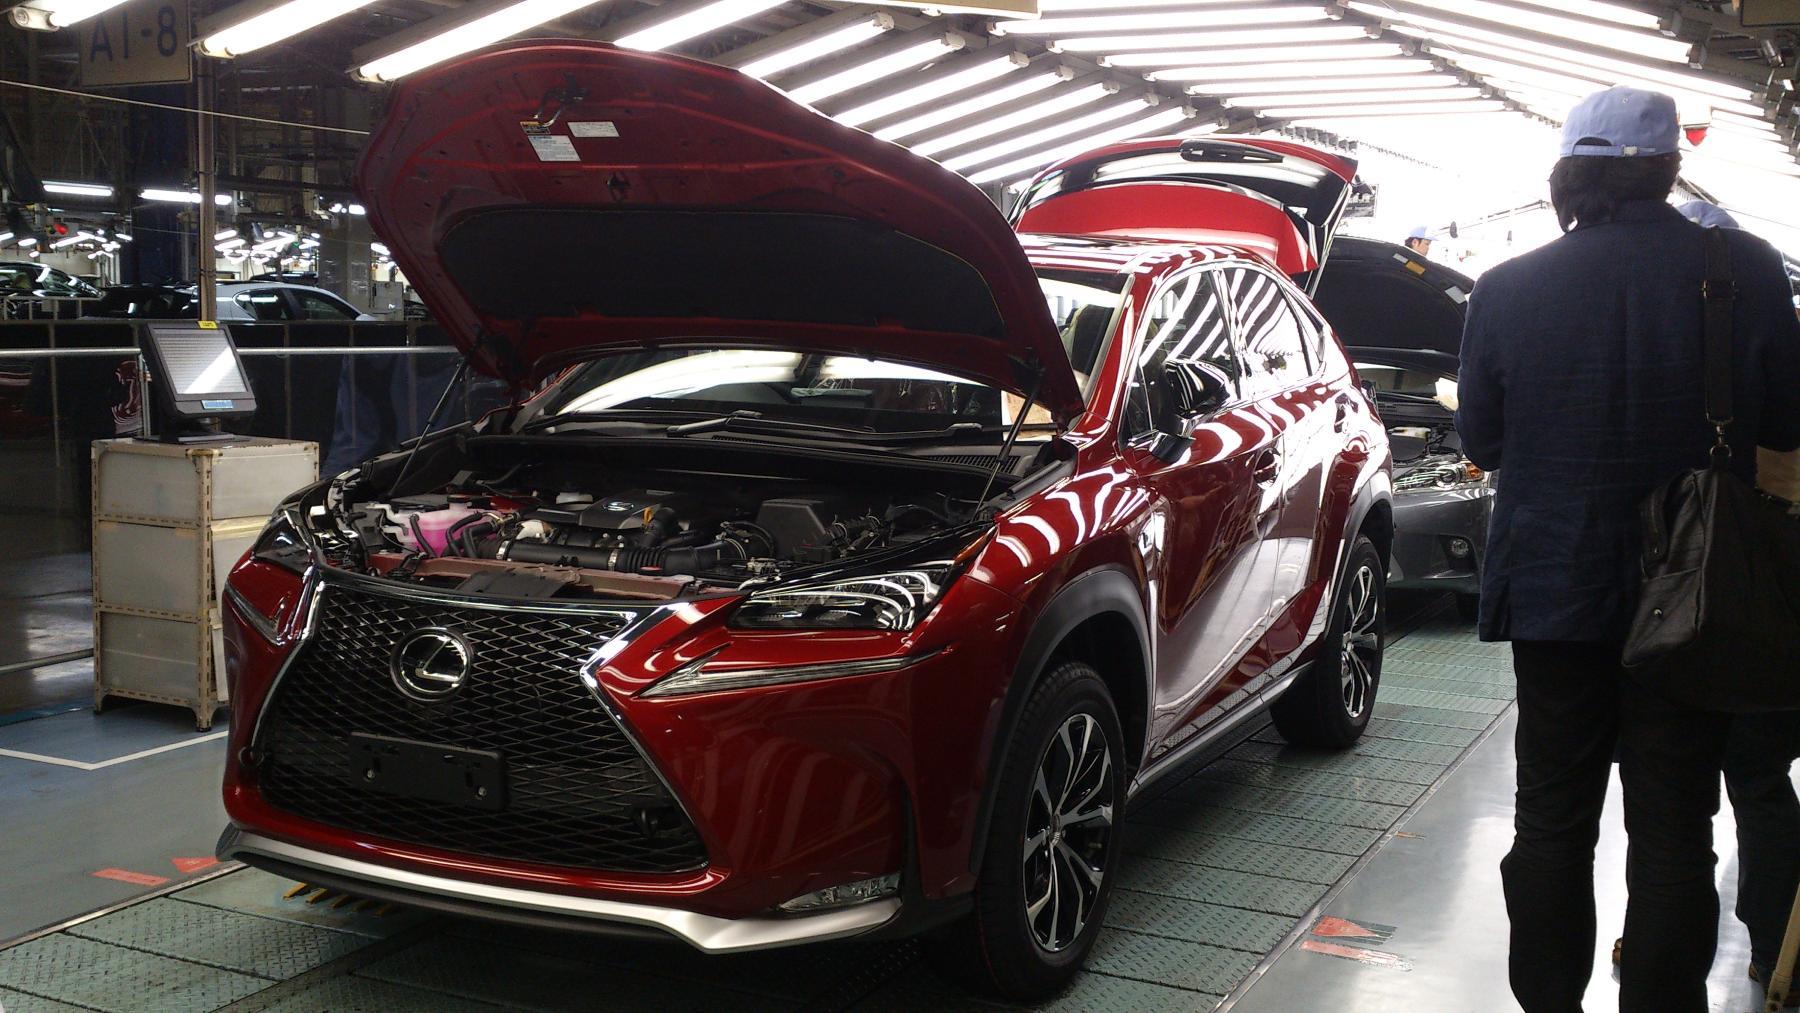 Toyota Rav4 Hybrid Lexus Starts NX Production in Japan, Revives Kanda Factory ...